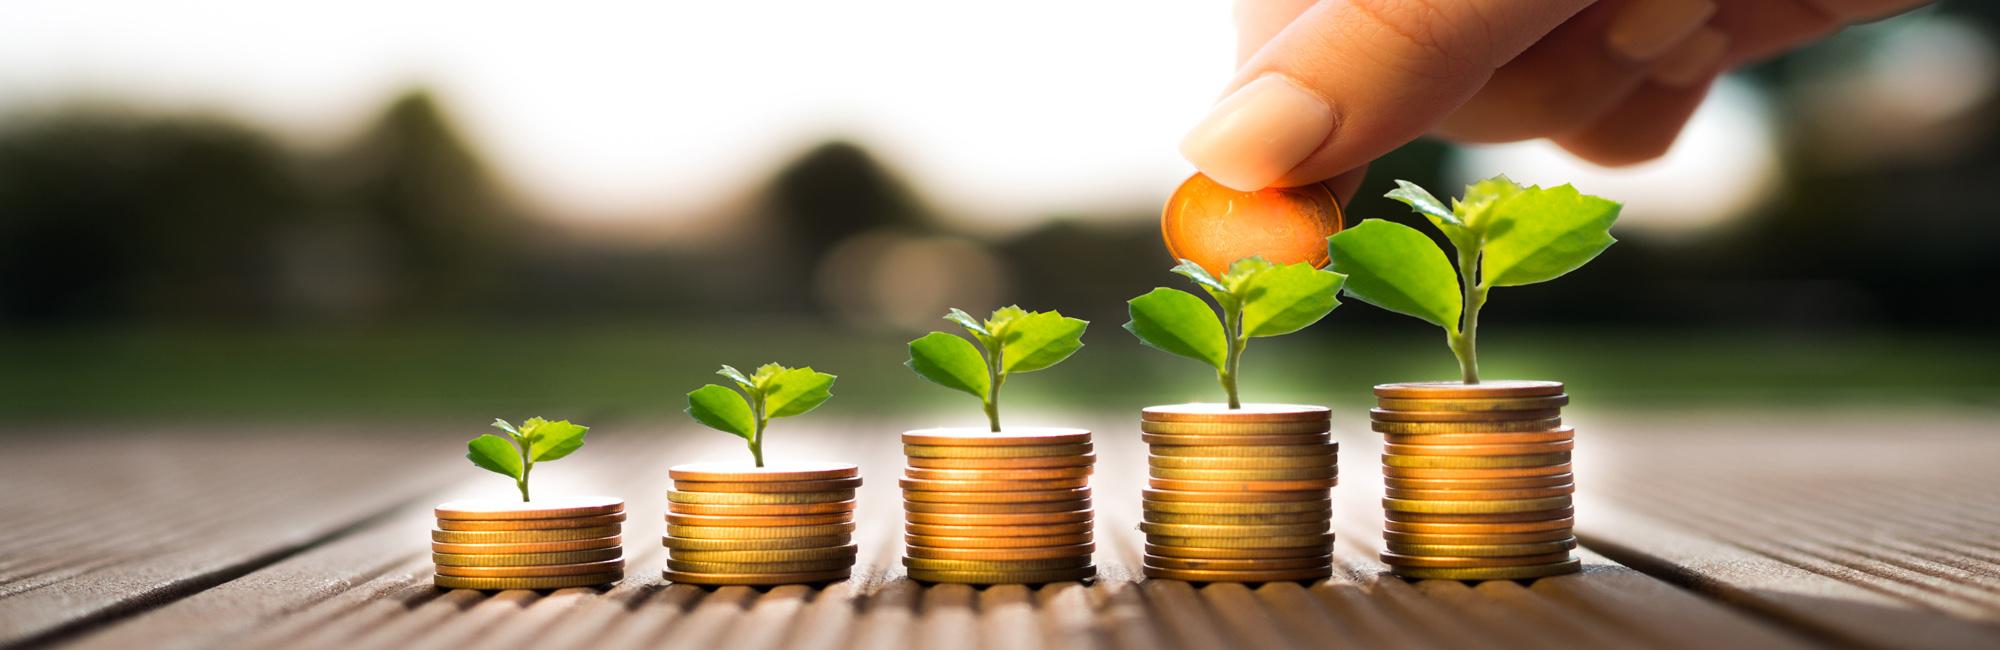 Savings Accounts Header Image